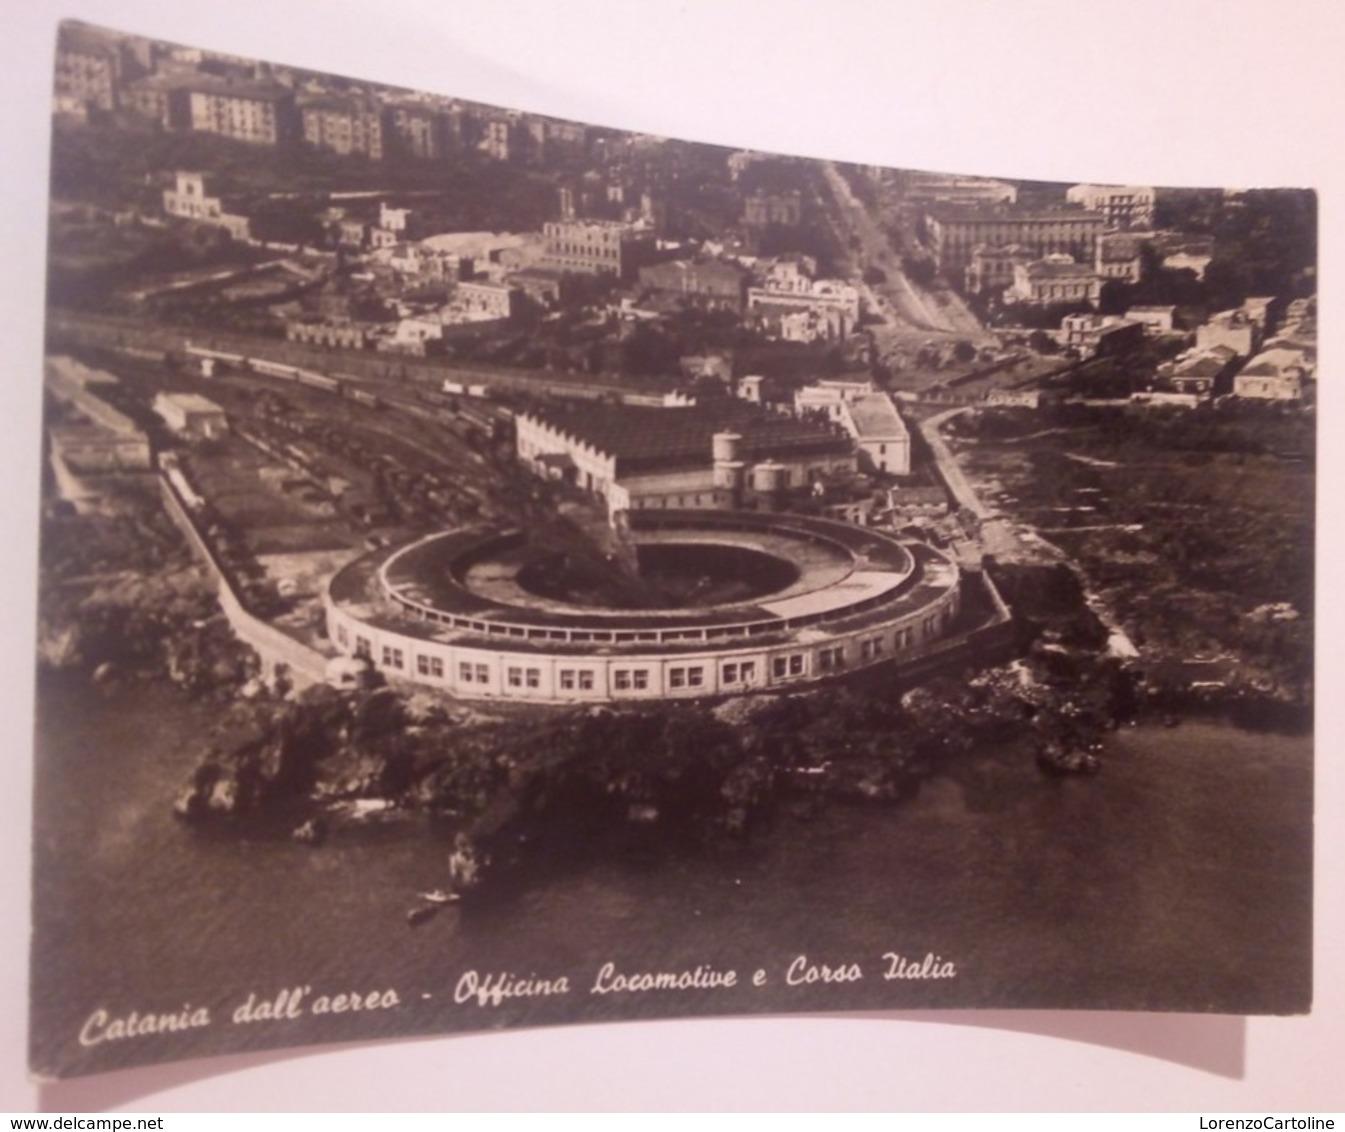 CATANIA Dall'aereo Officina Locomotive E Corso Italia VIAGGIATA 1950 - Catania